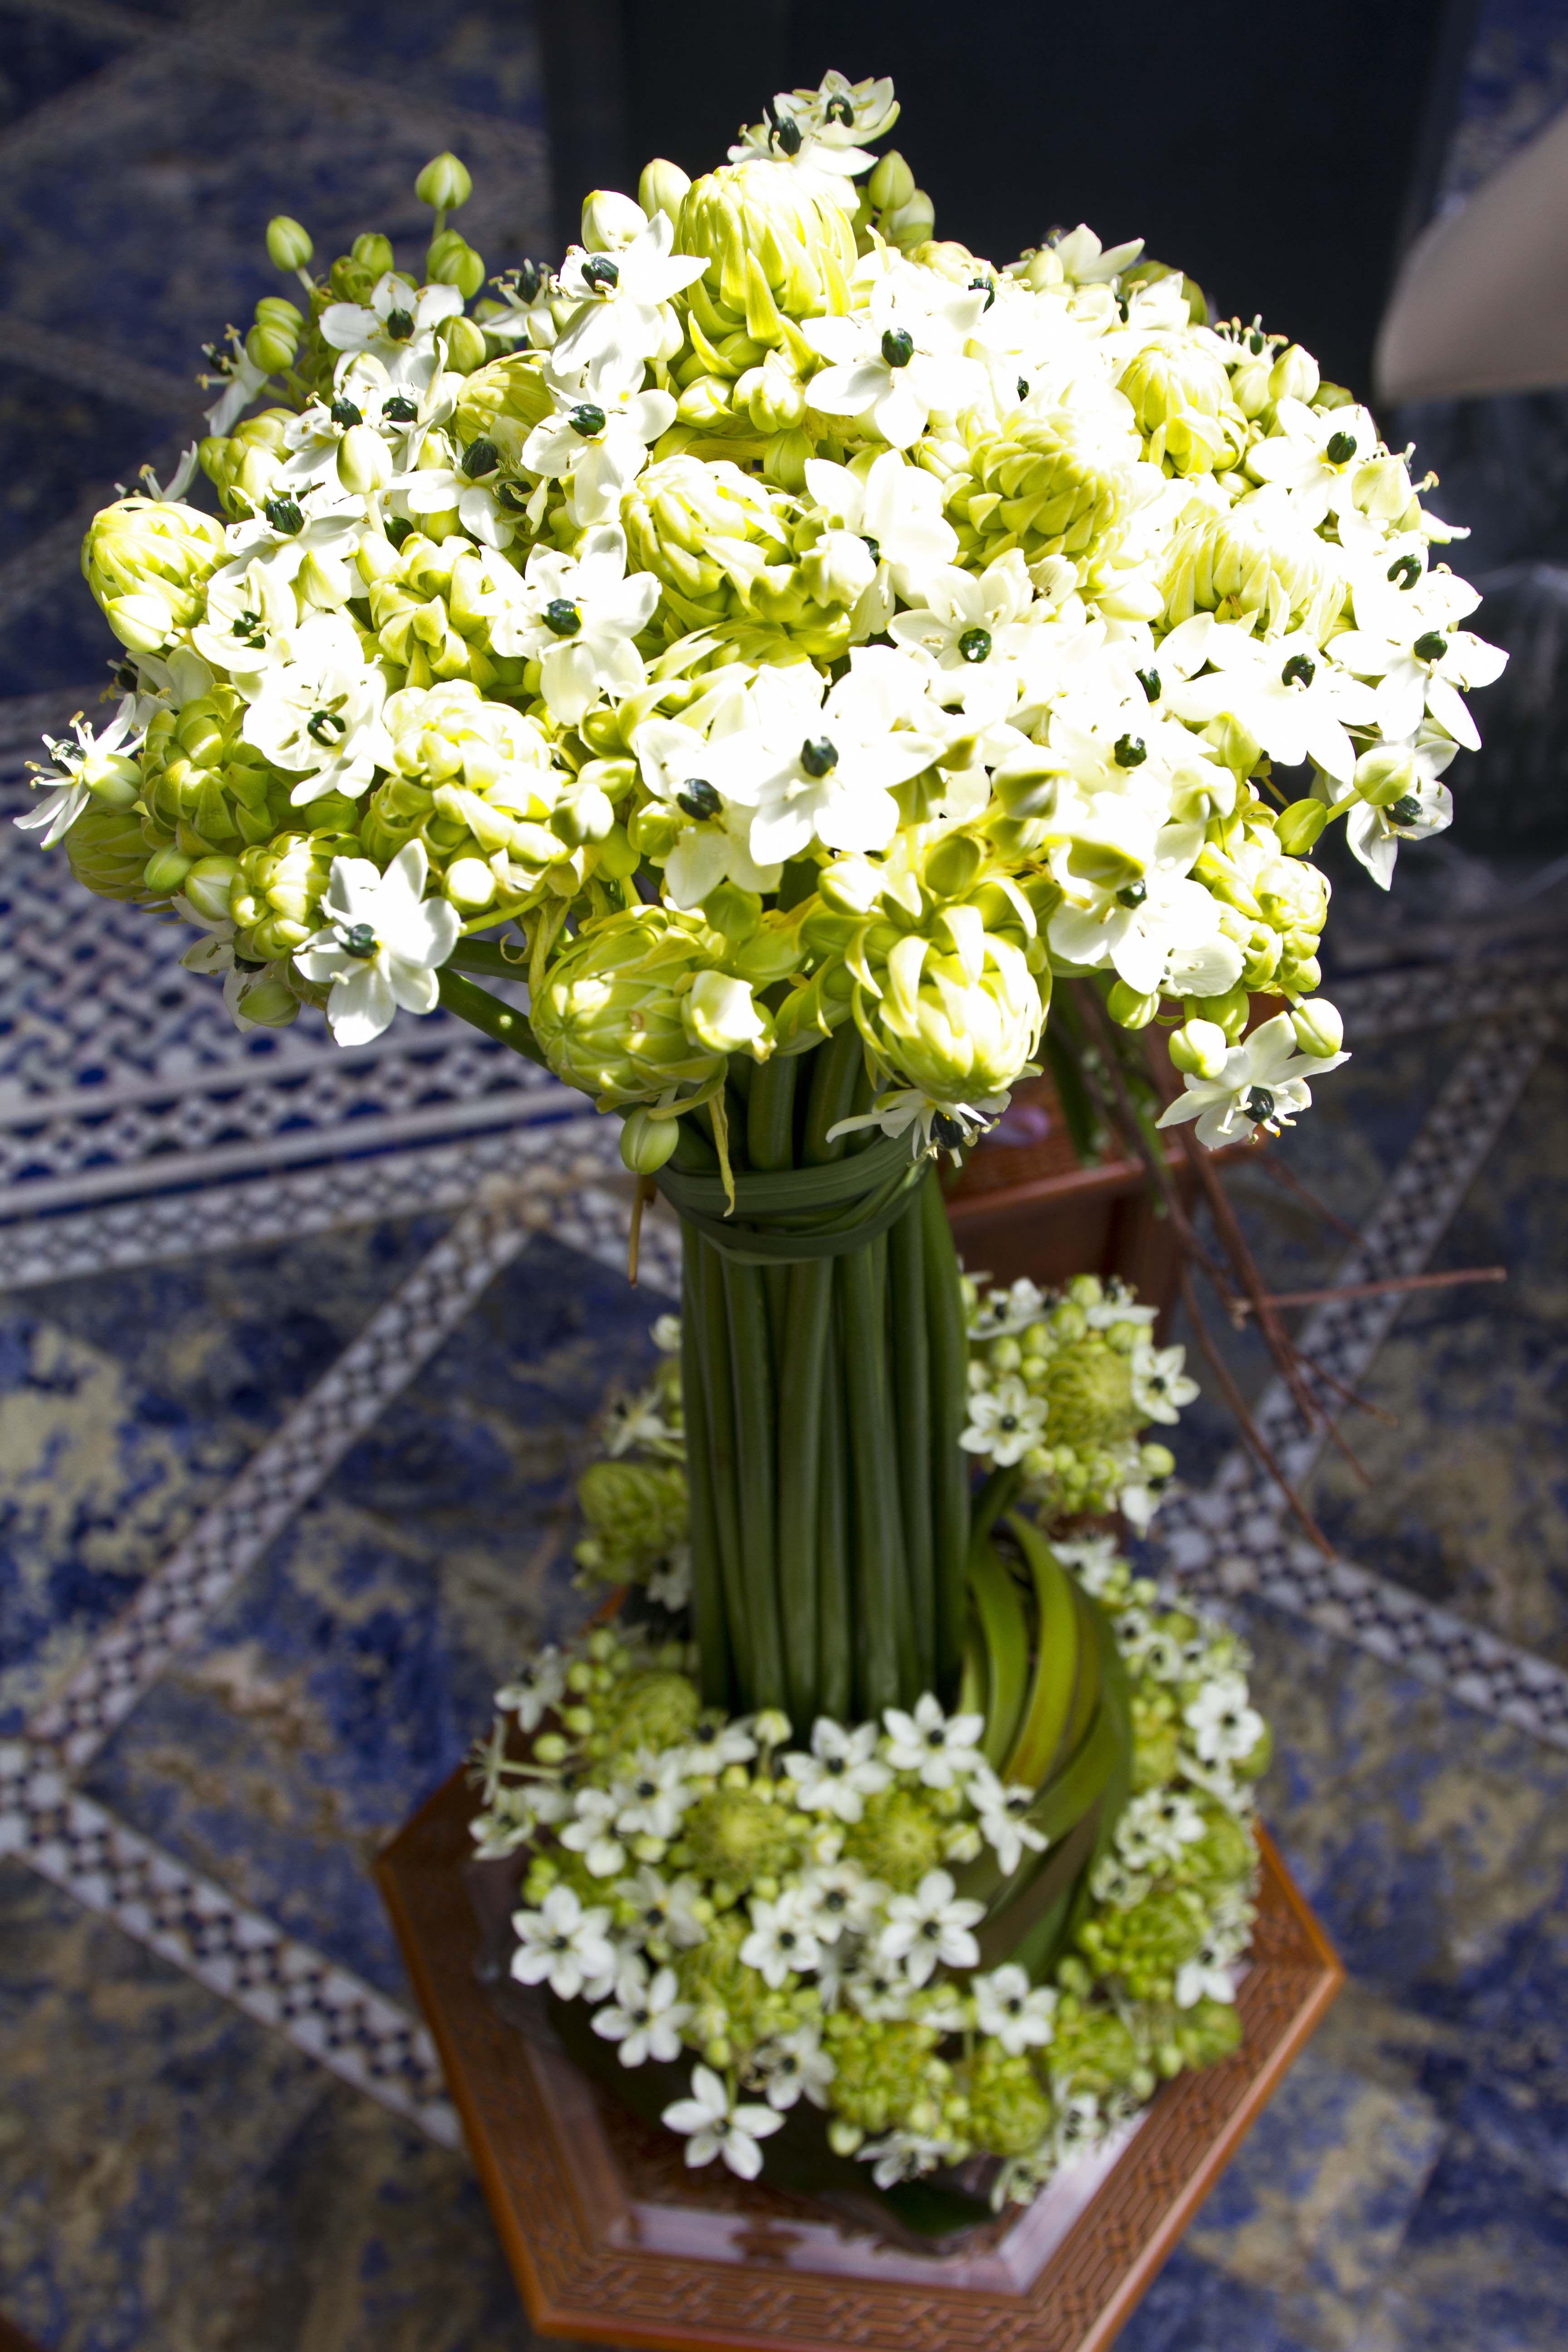 Delicate White Flower Arrangement Beautifies Every Corner